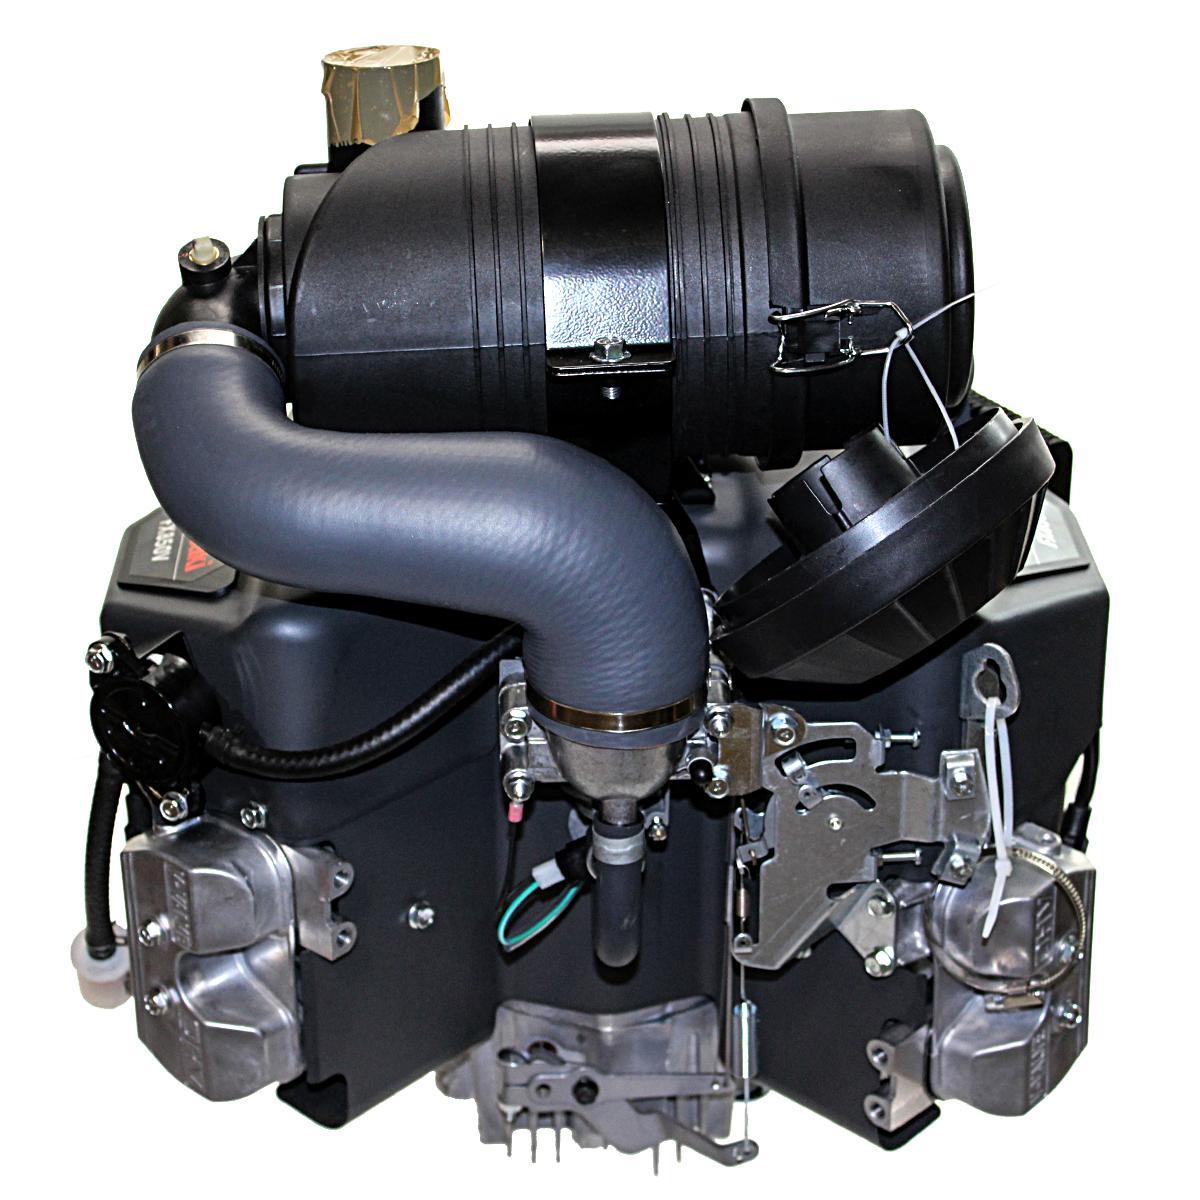 FX850V-HS00S Kawasaki Gas Engines, Vertical Vertical 1-1/8 ... on